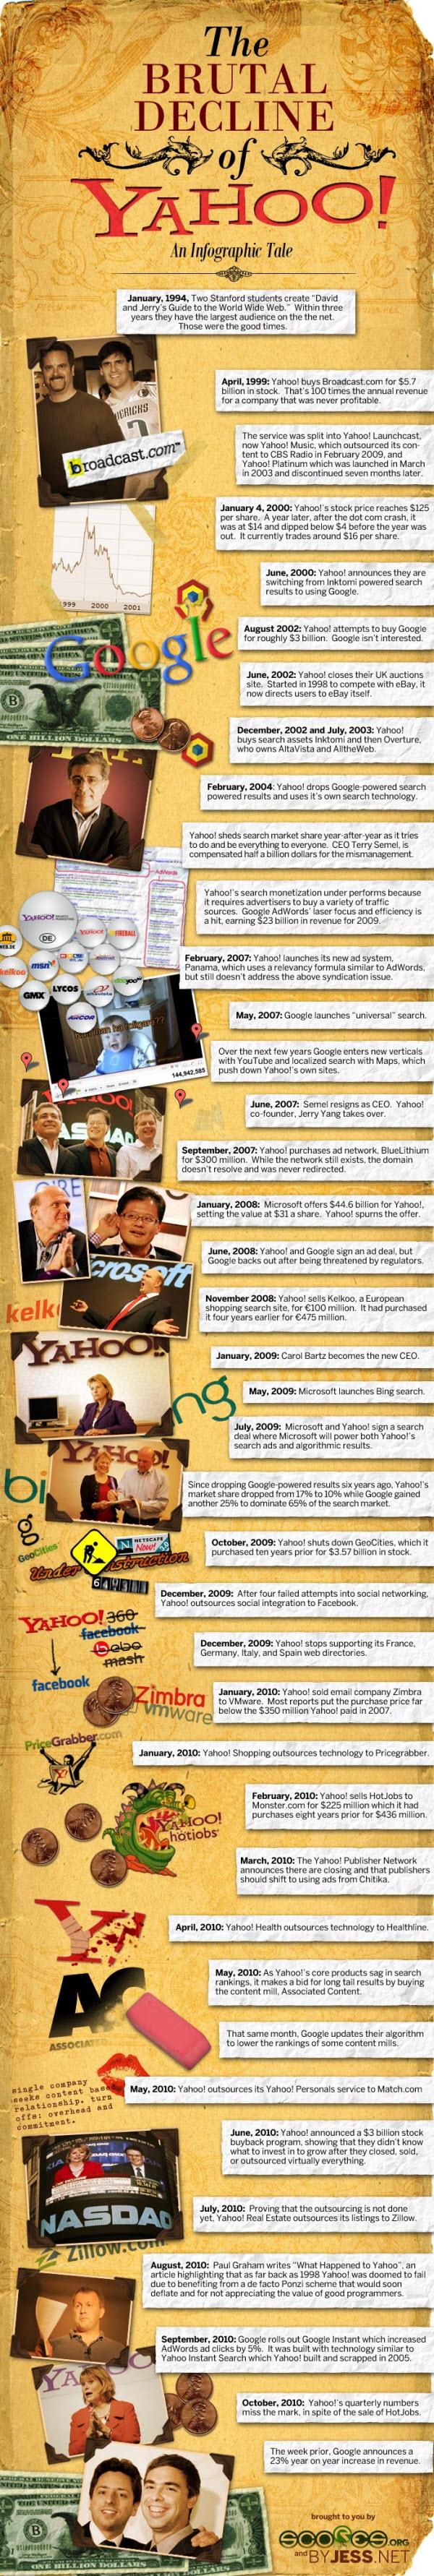 The Brutal Decline of Yahoo!